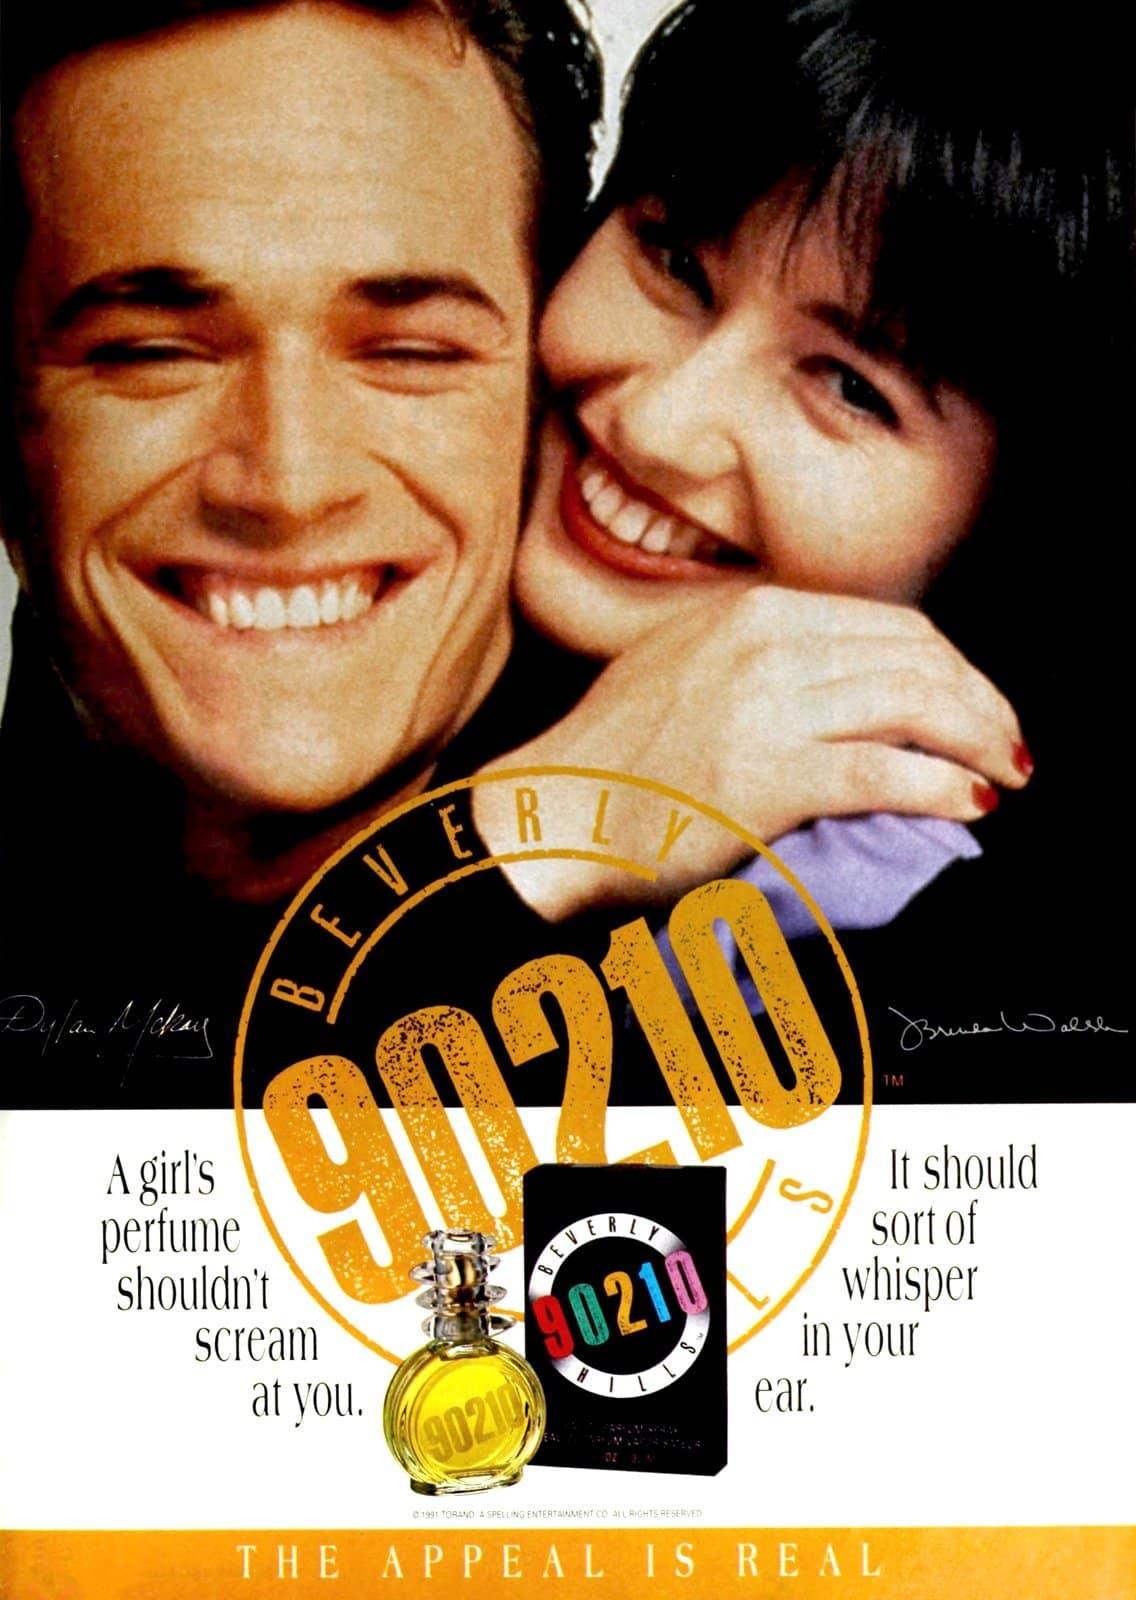 Beverly Hills 90210 perfume (1992)